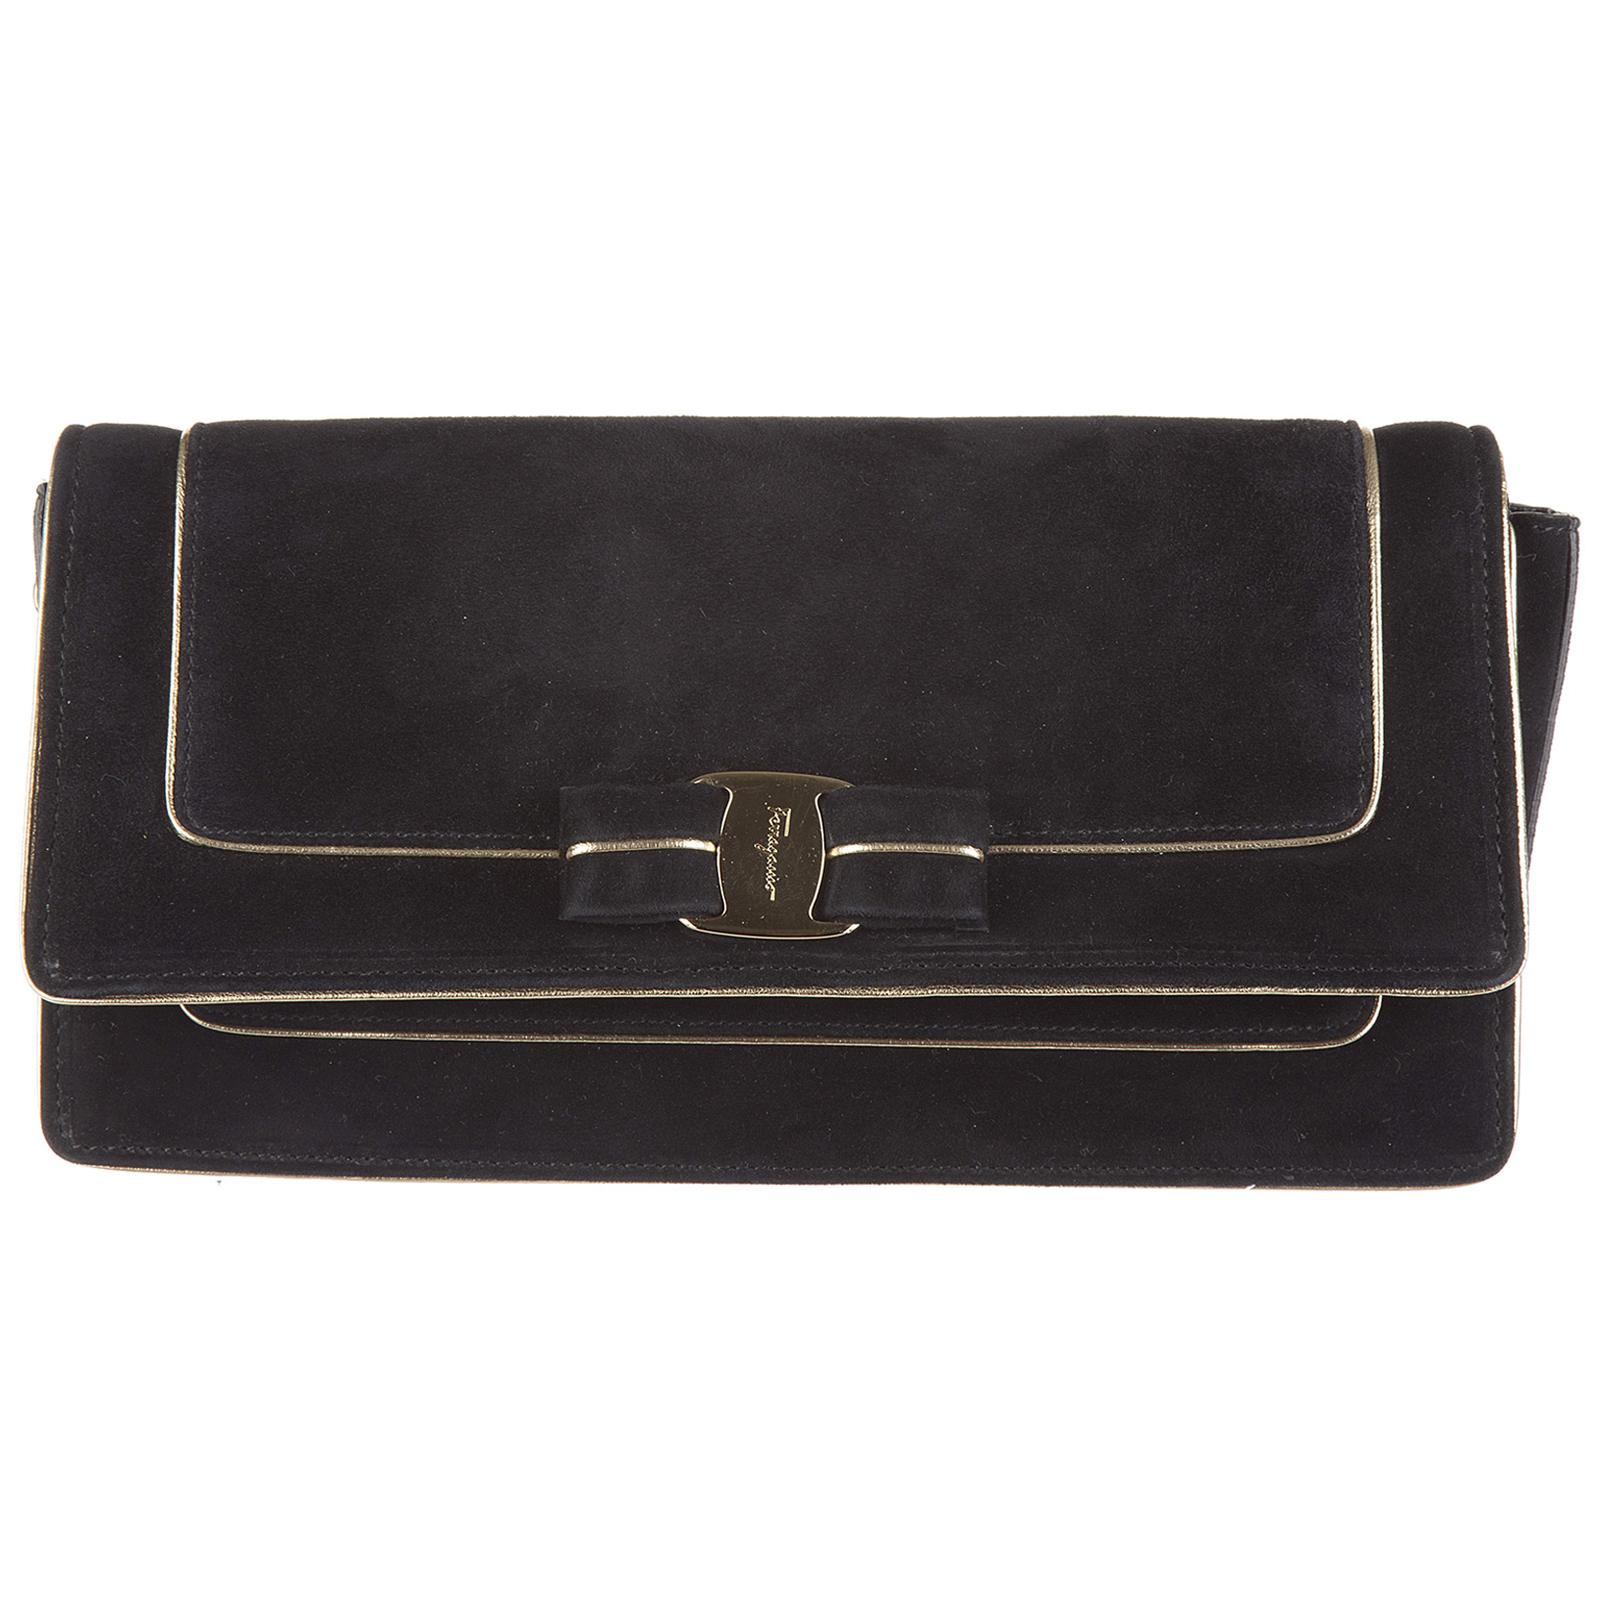 Salvatore Ferragamo Women s suede clutch handbag bag purse camy fed2ce547f588